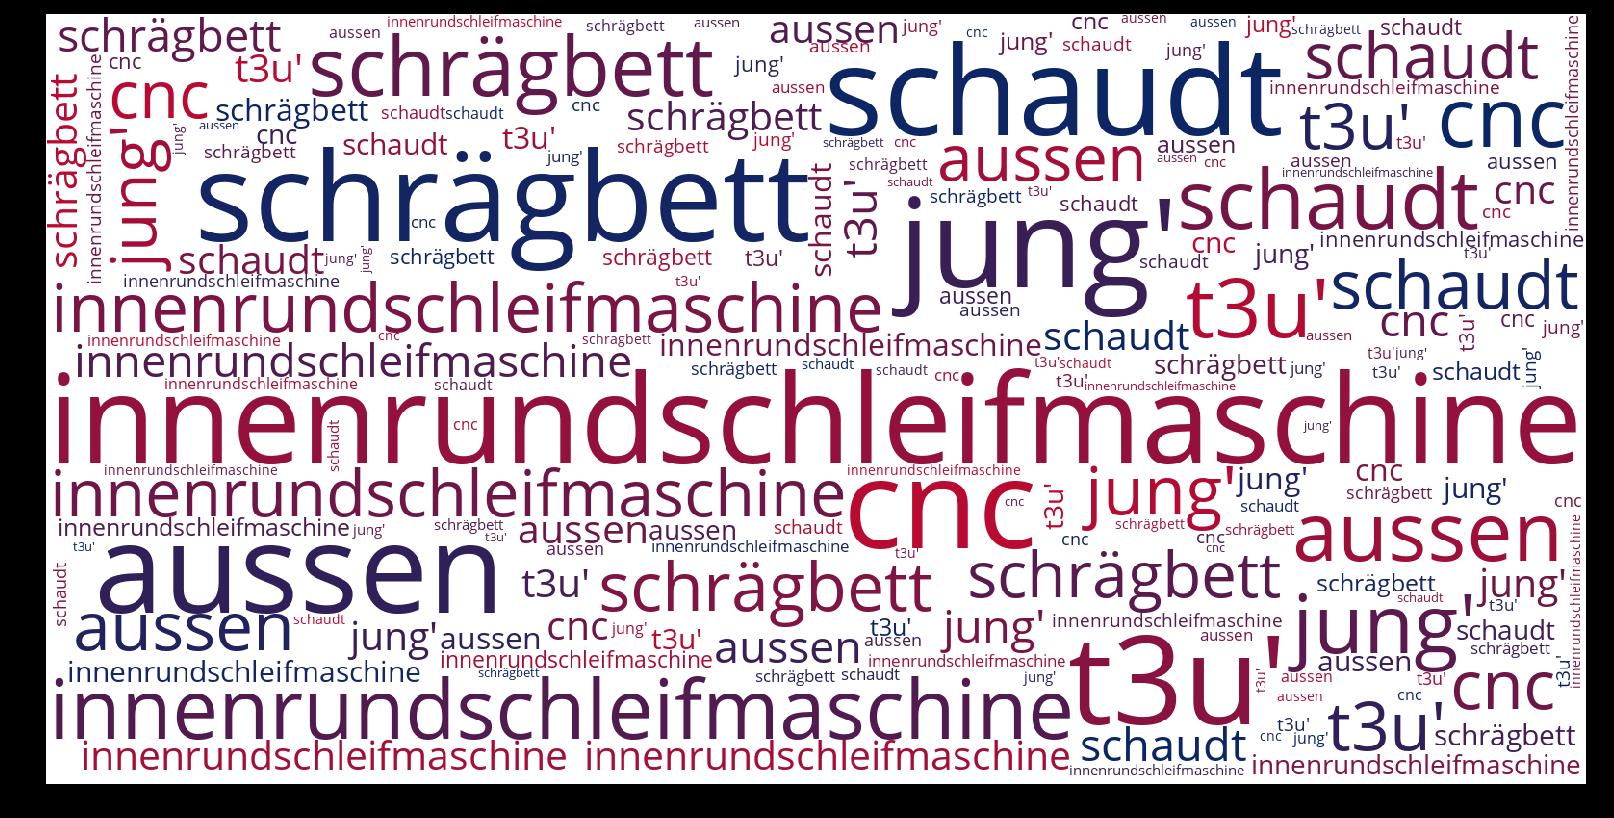 Innenrundschleifmaschine-wordcloud